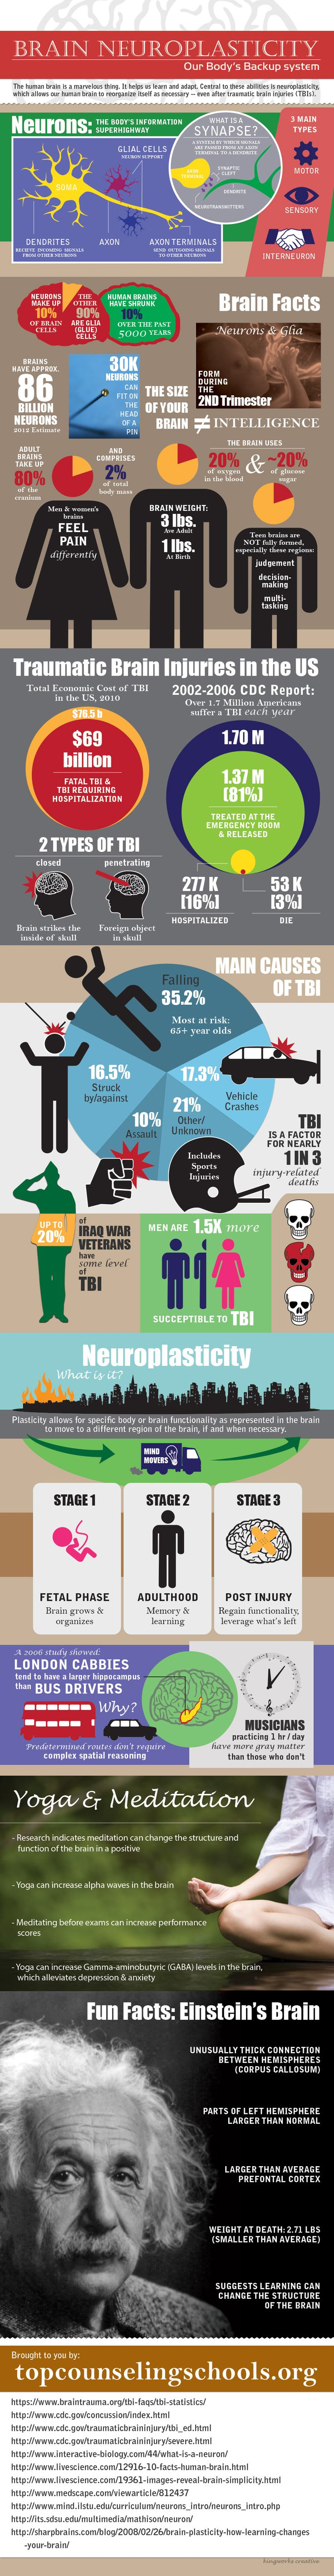 Brain Neuroplasticity [INFOGRAPHIC] #brain #neuroplasticity